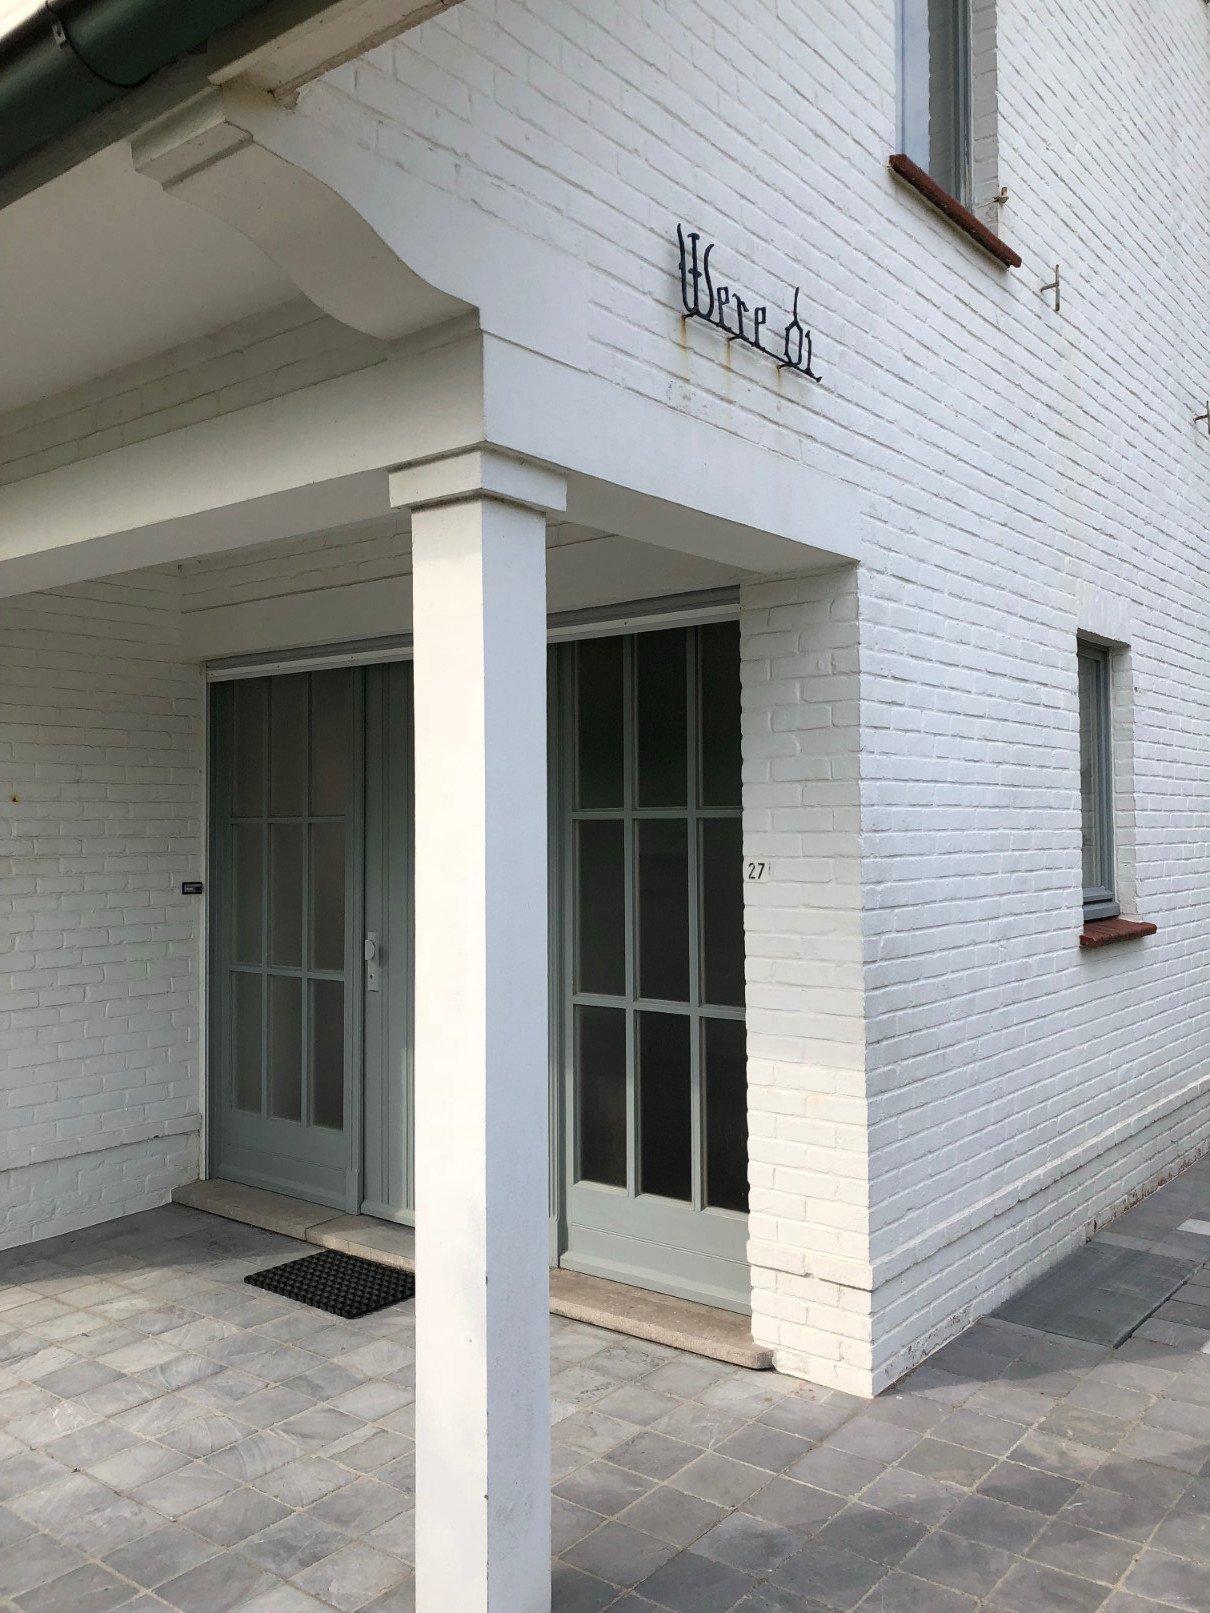 Rietveldprojects-Villa Were Di - Te Koop : Te Huur (per week)24.jpg